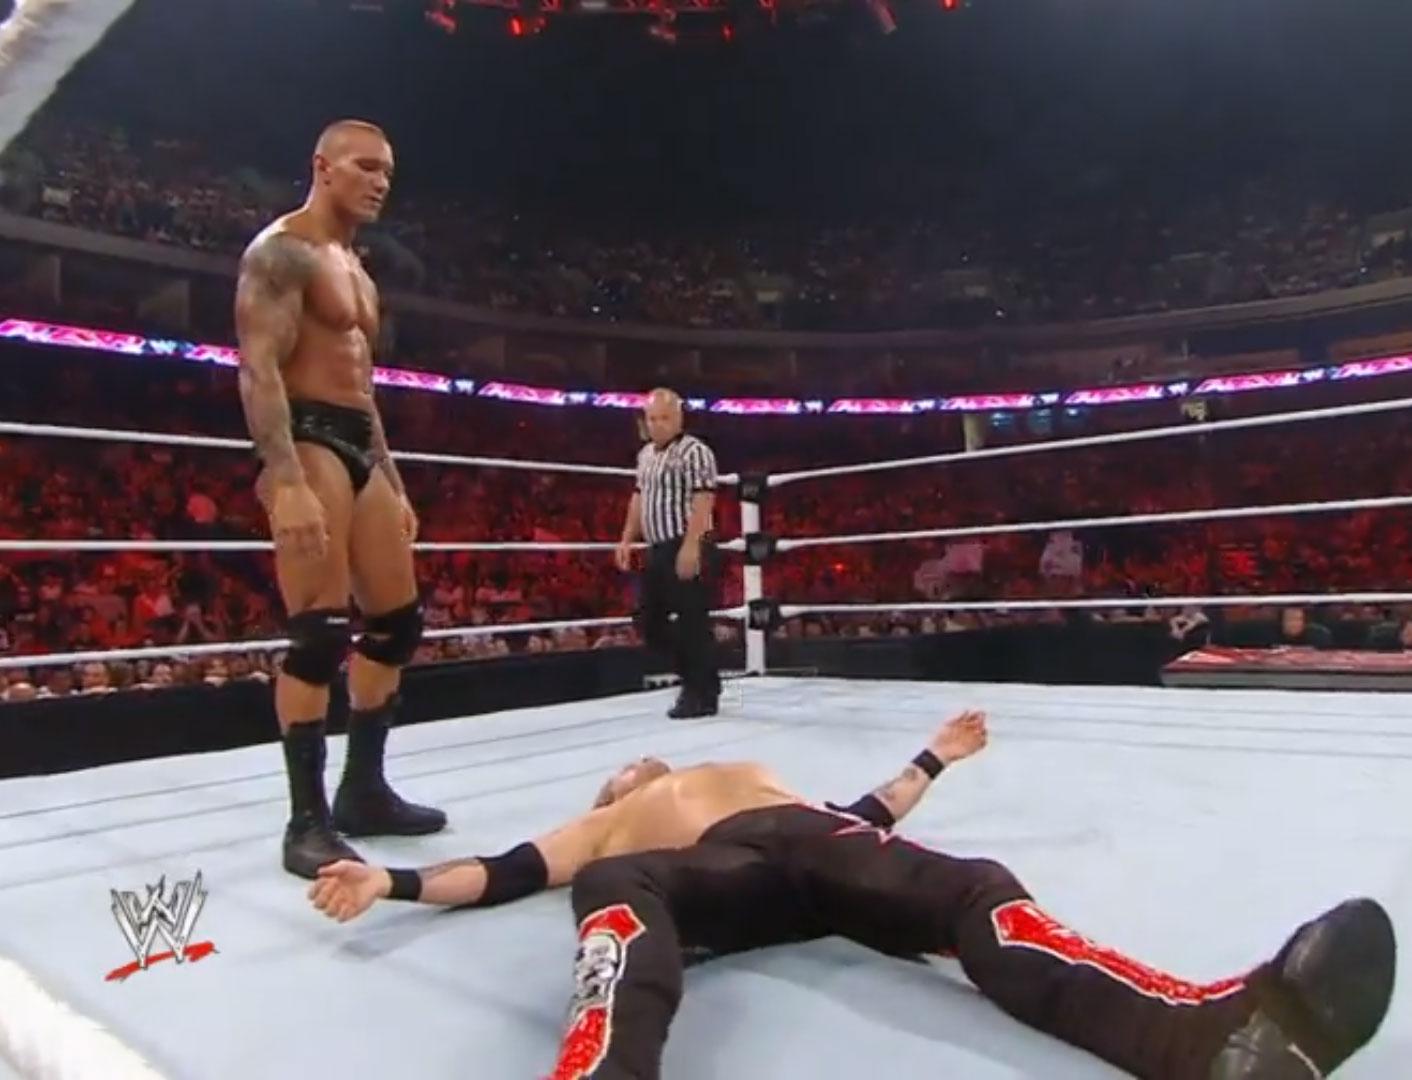 Randy Orton vs. Chris Jericho vs. Edge  Triple-Threat WWE Monday Night Raw Jul 19th 2010